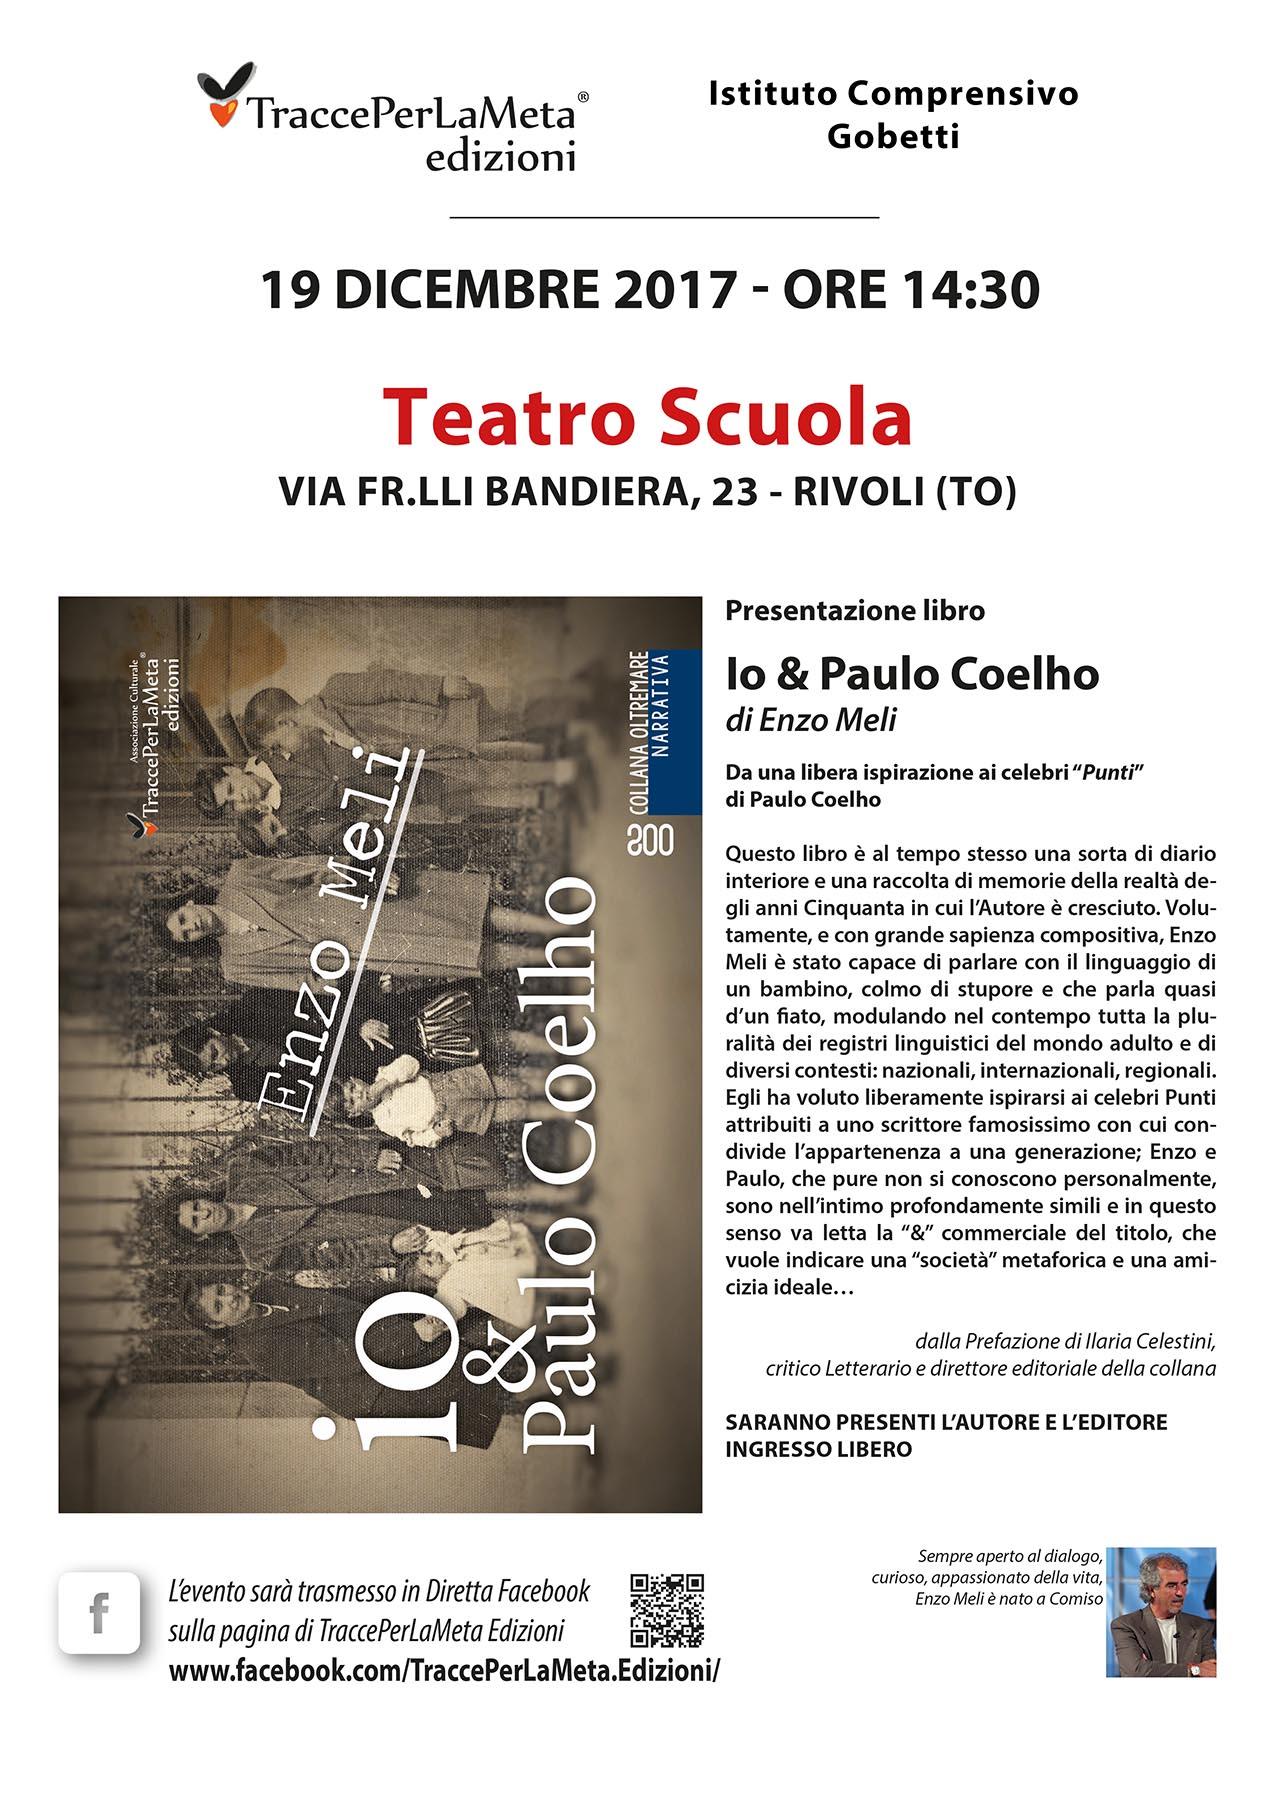 19.12.2017 – Ist. Compr. Gobetti ed Enzo Meli – io & Paulo Coelho – LIVE FACEBOOK